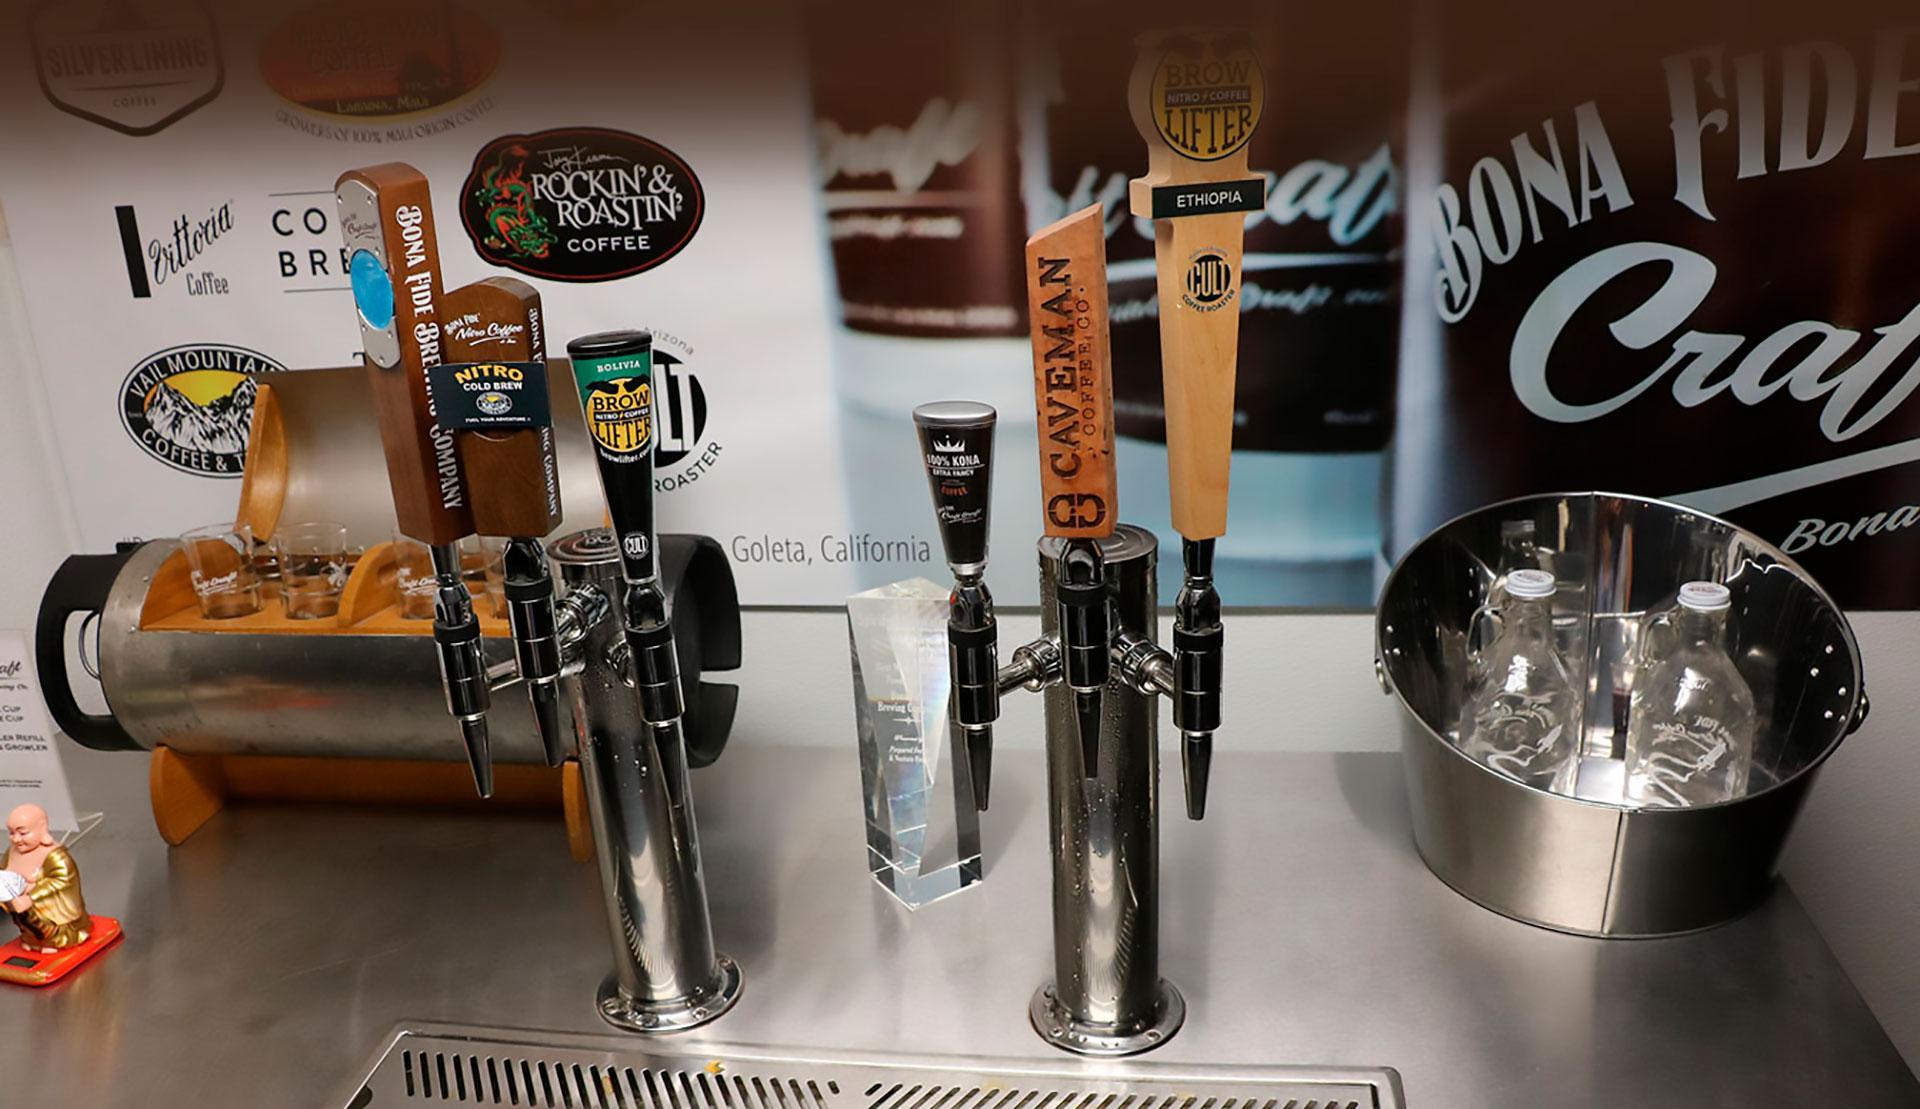 Nitro Coffee on Tap by Bona Fide Brewing Company